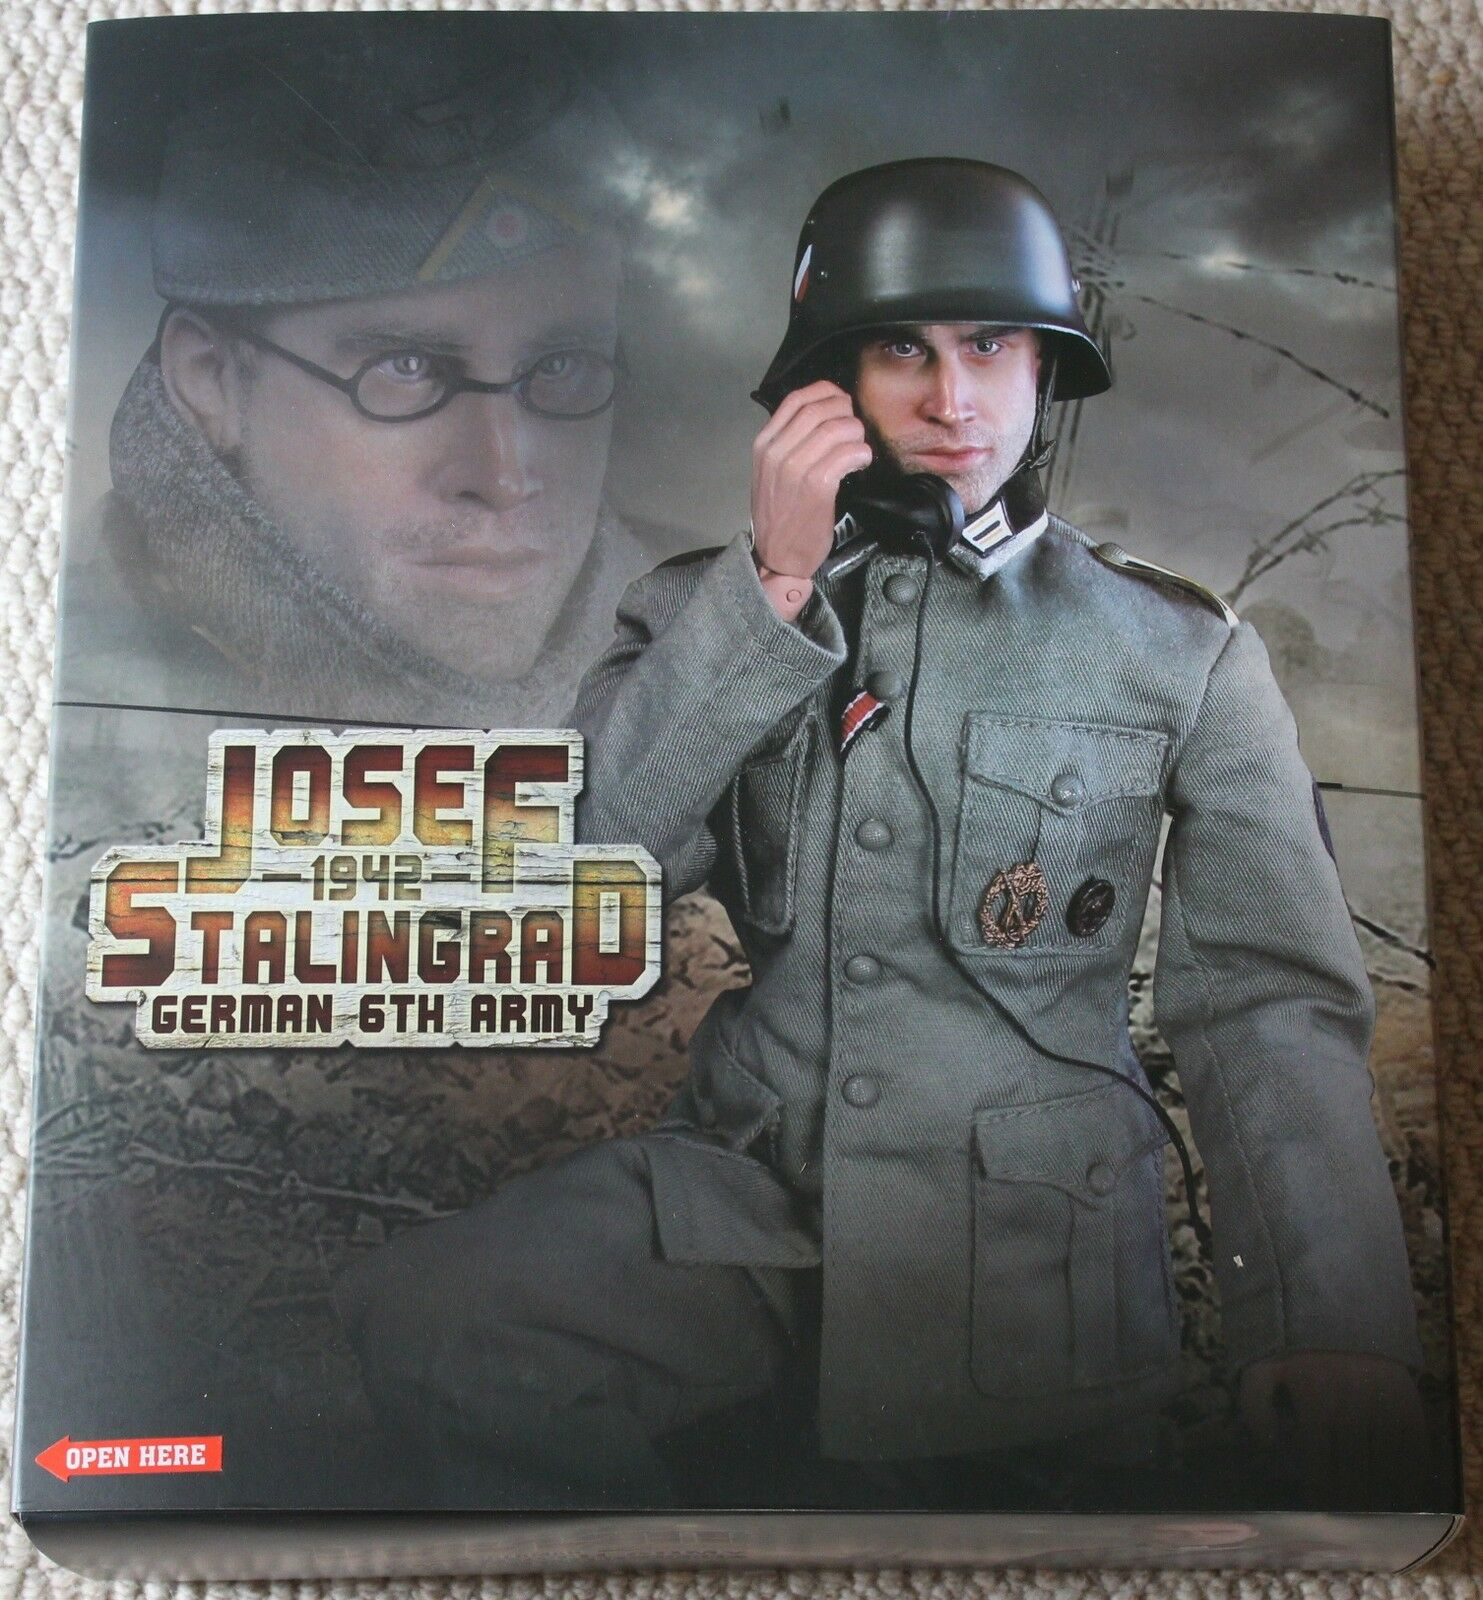 Did action figure german josef starlingrad 1 6 12'' boxed hot toy ww11 dragon